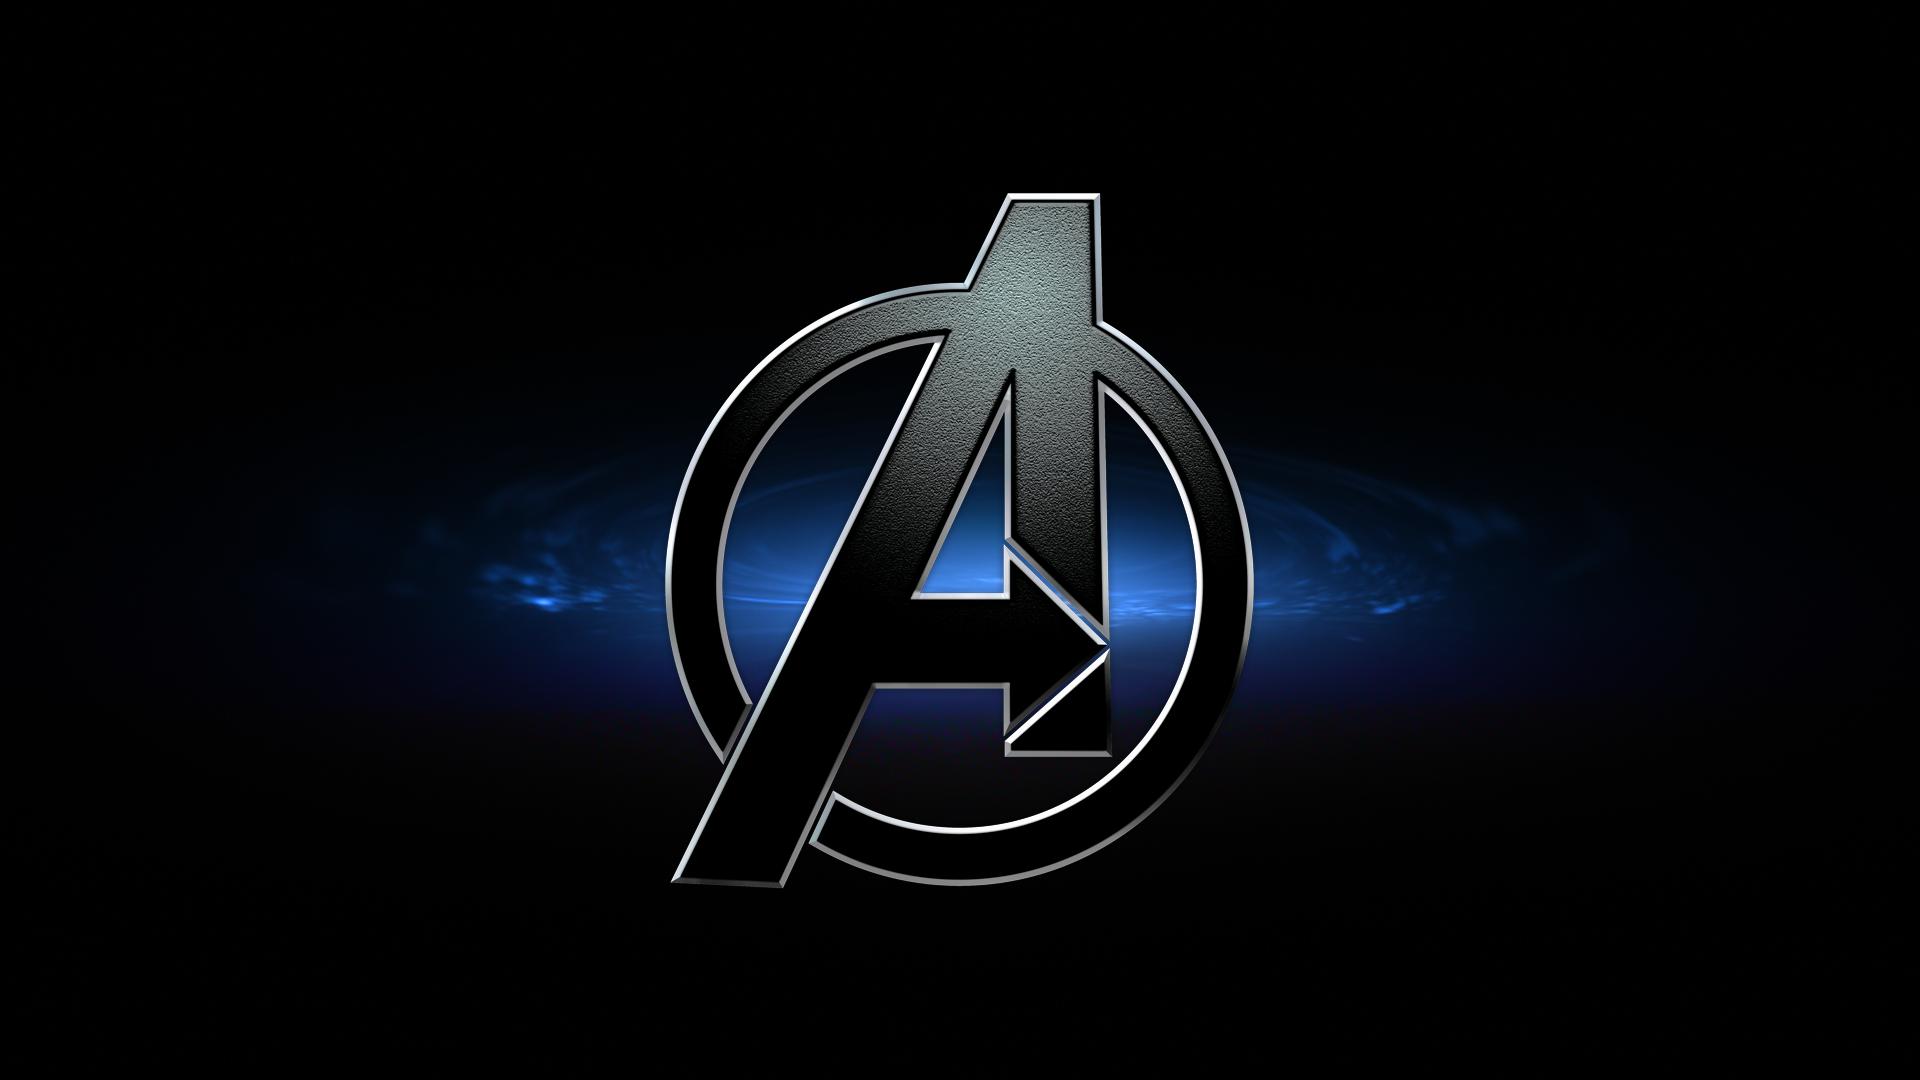 Pin by PIN5VERSE on COMICS • Avengers Avengers logo